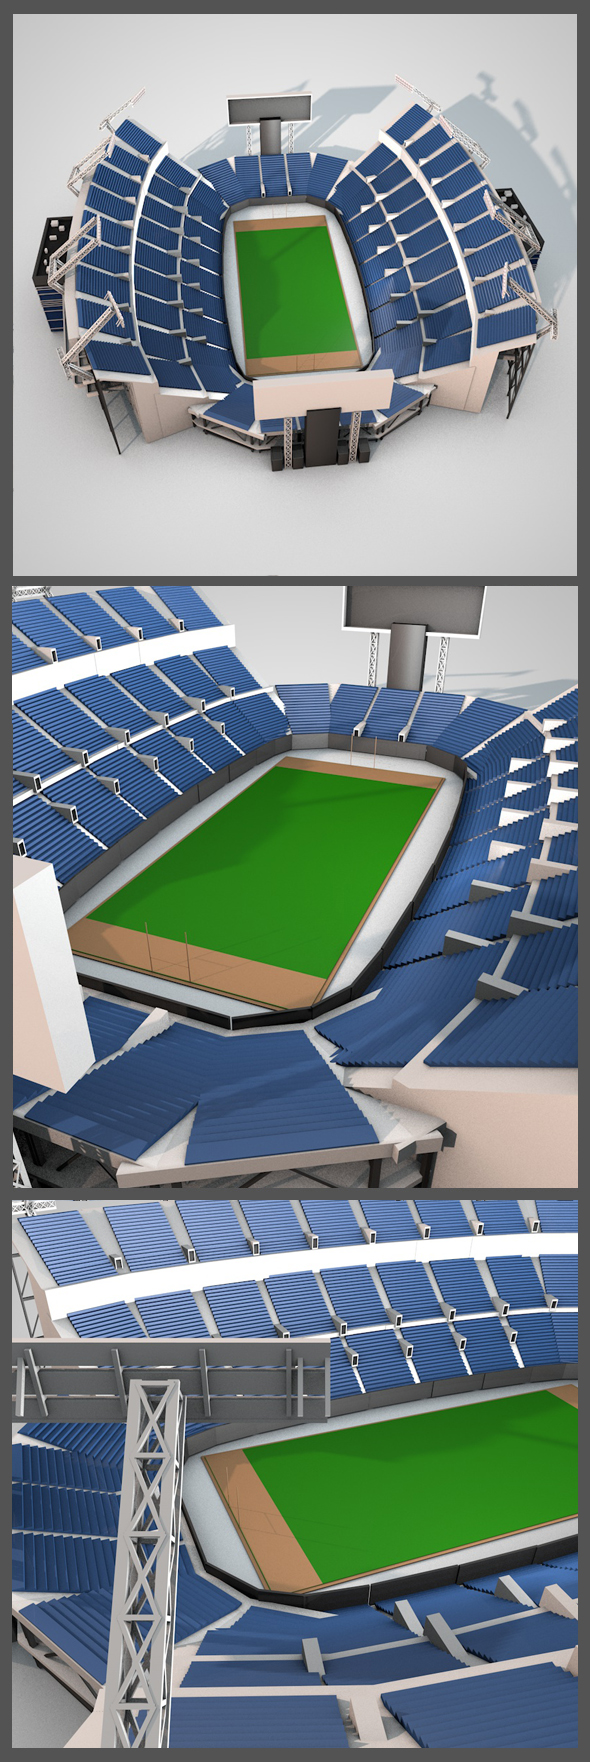 EverBank Field - 3DOcean Item for Sale